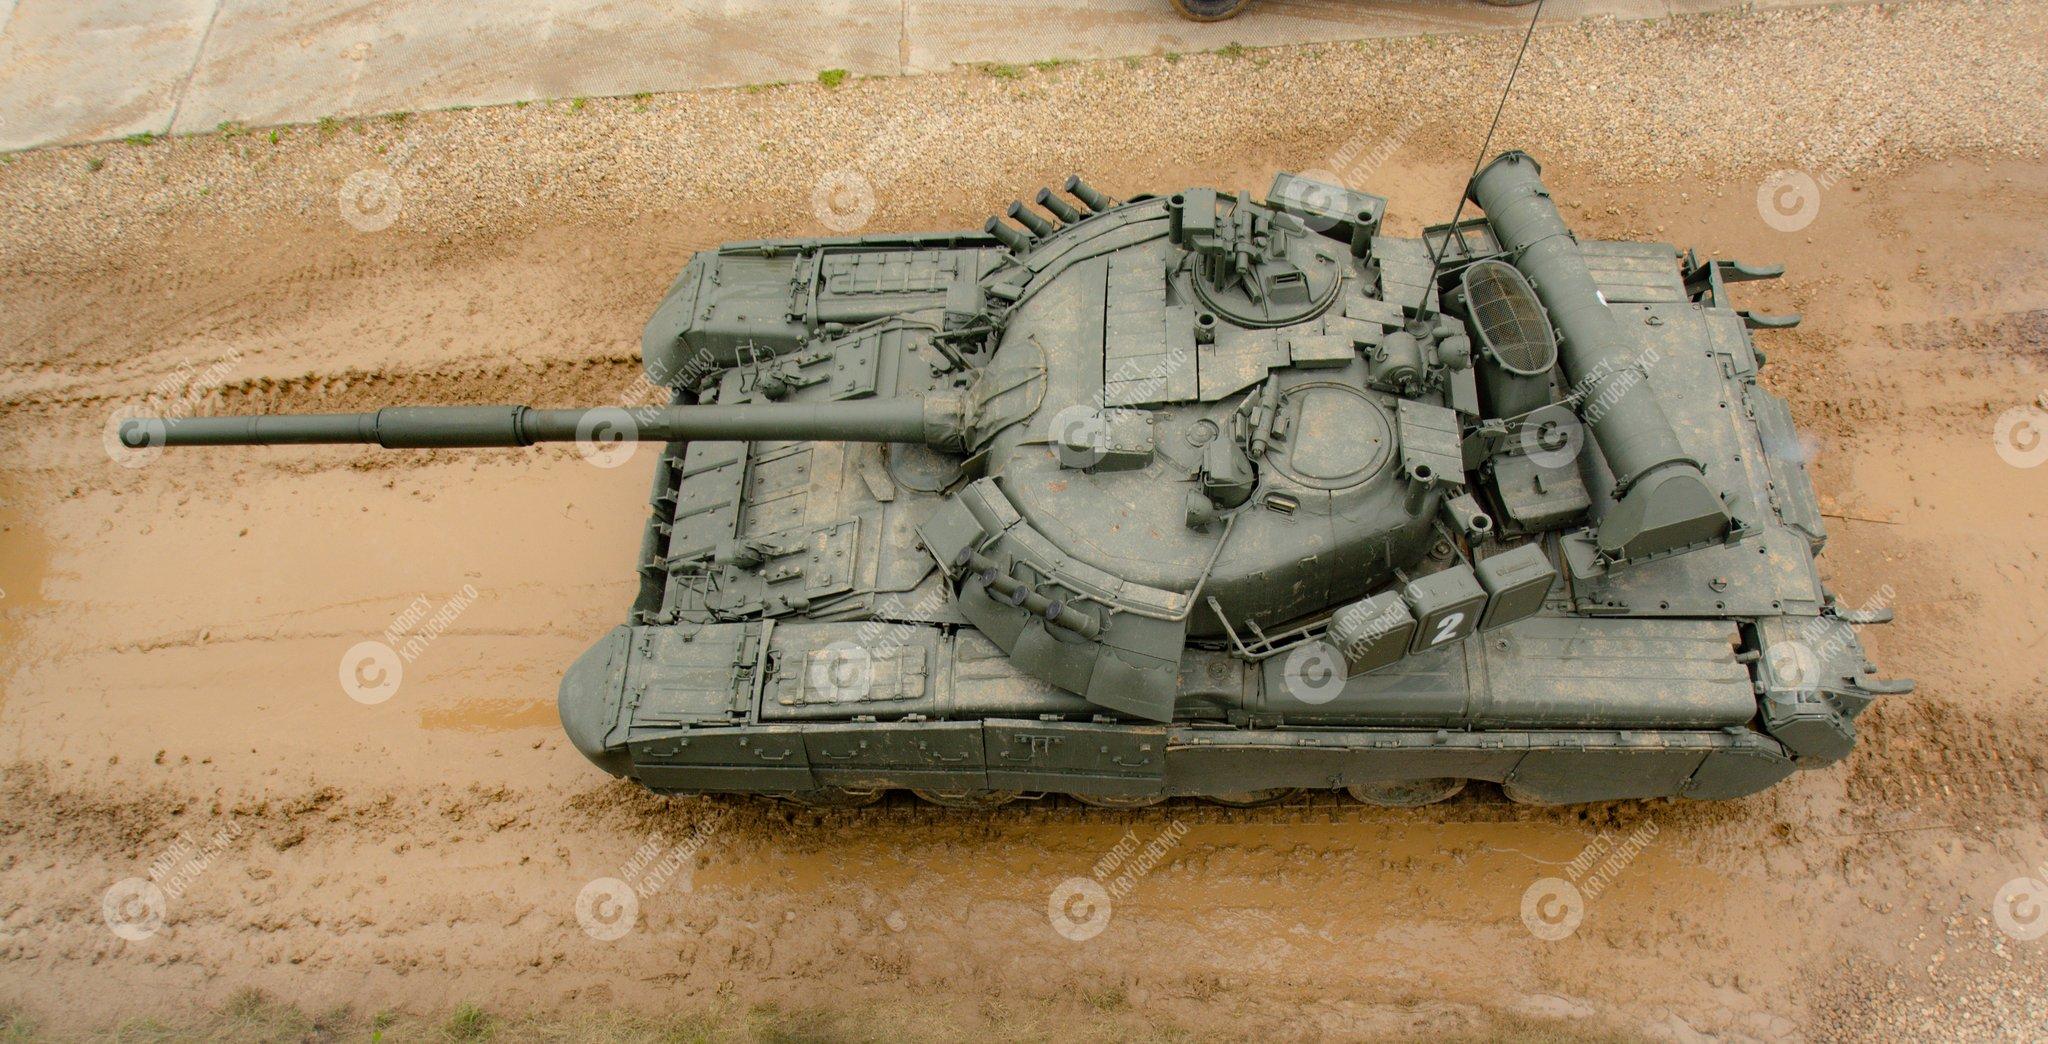 T-80U top view